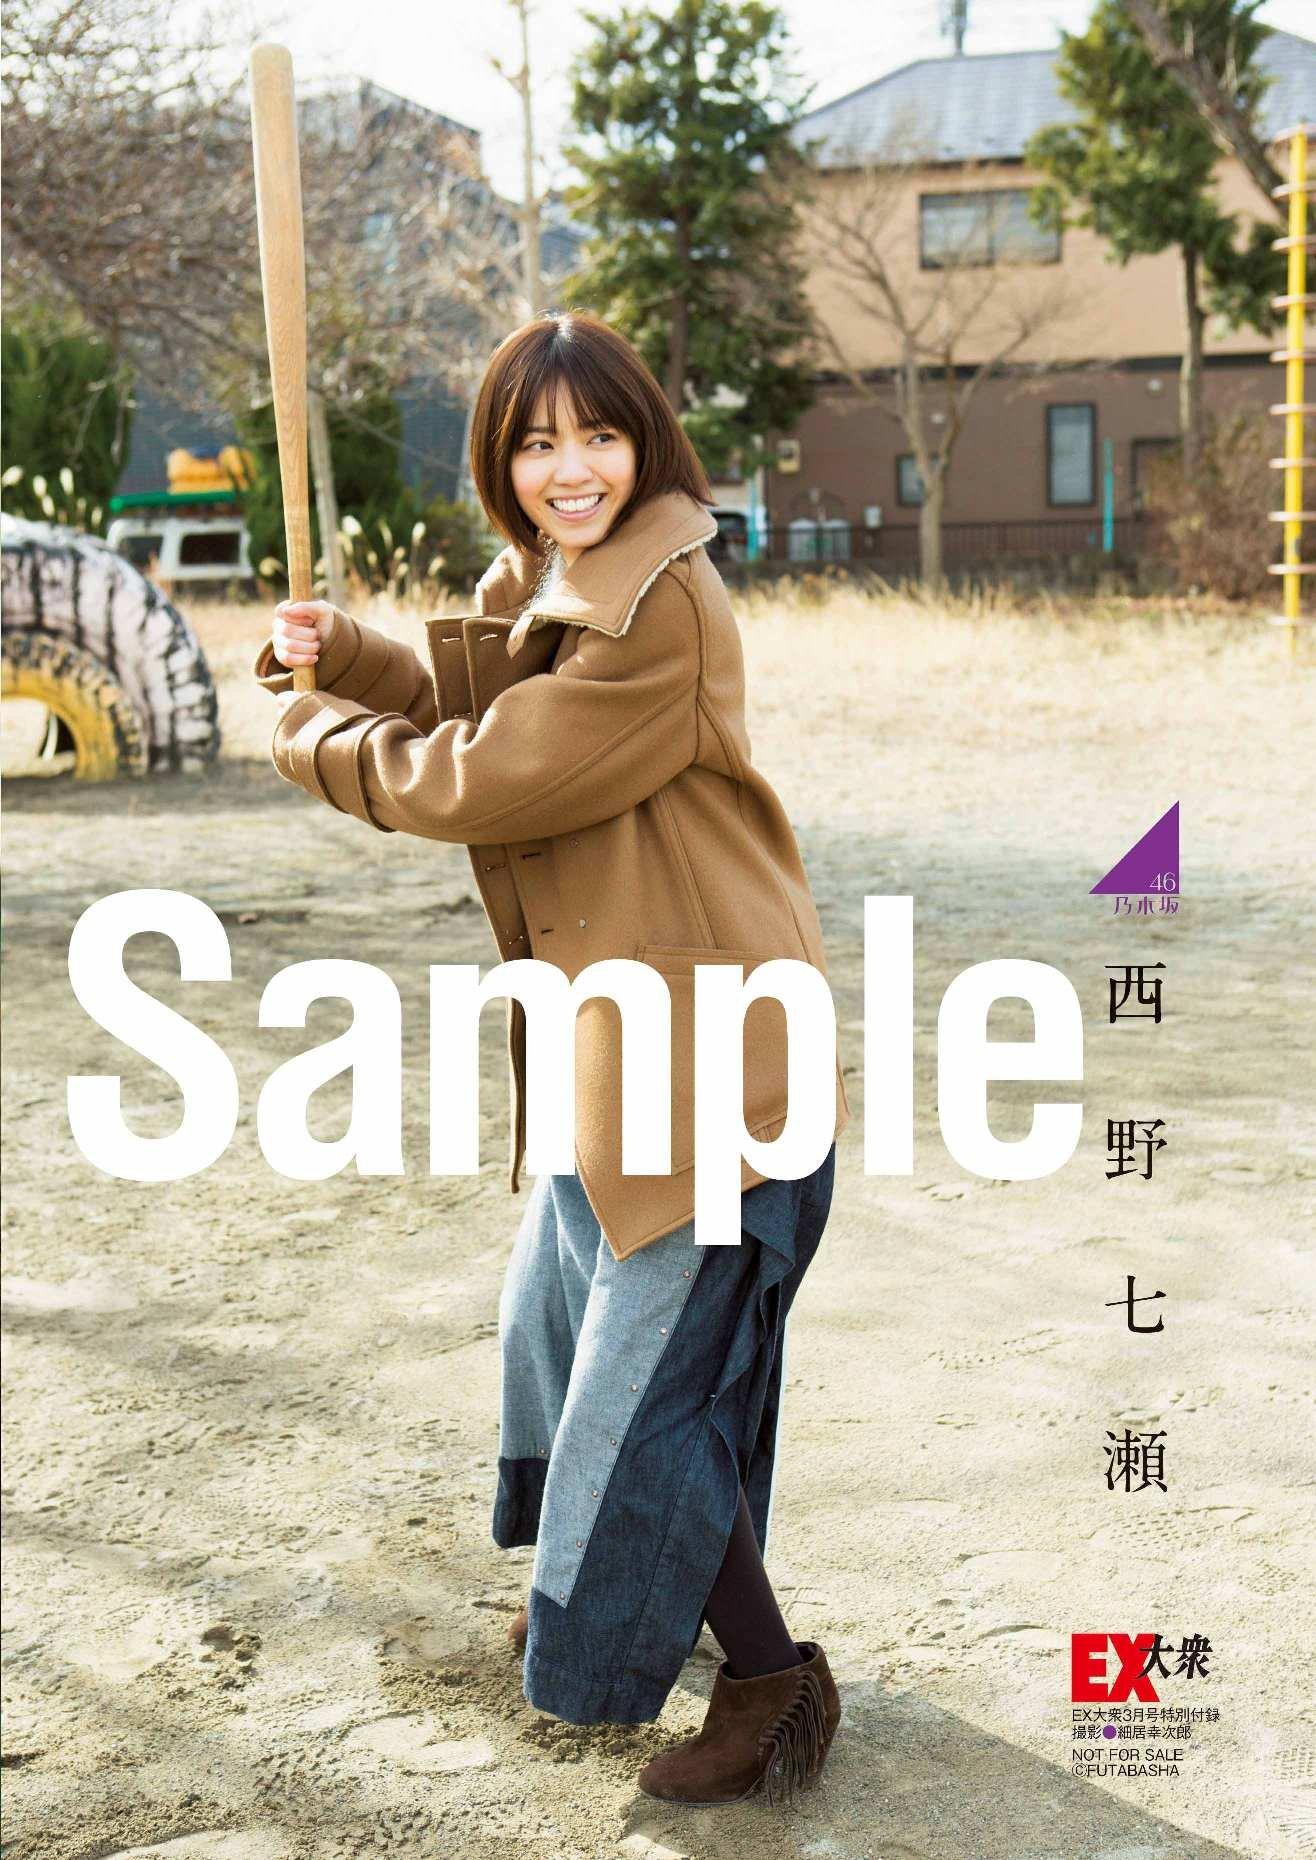 EX (イーエックス) 大衆 2018年3月号 西野七瀬5